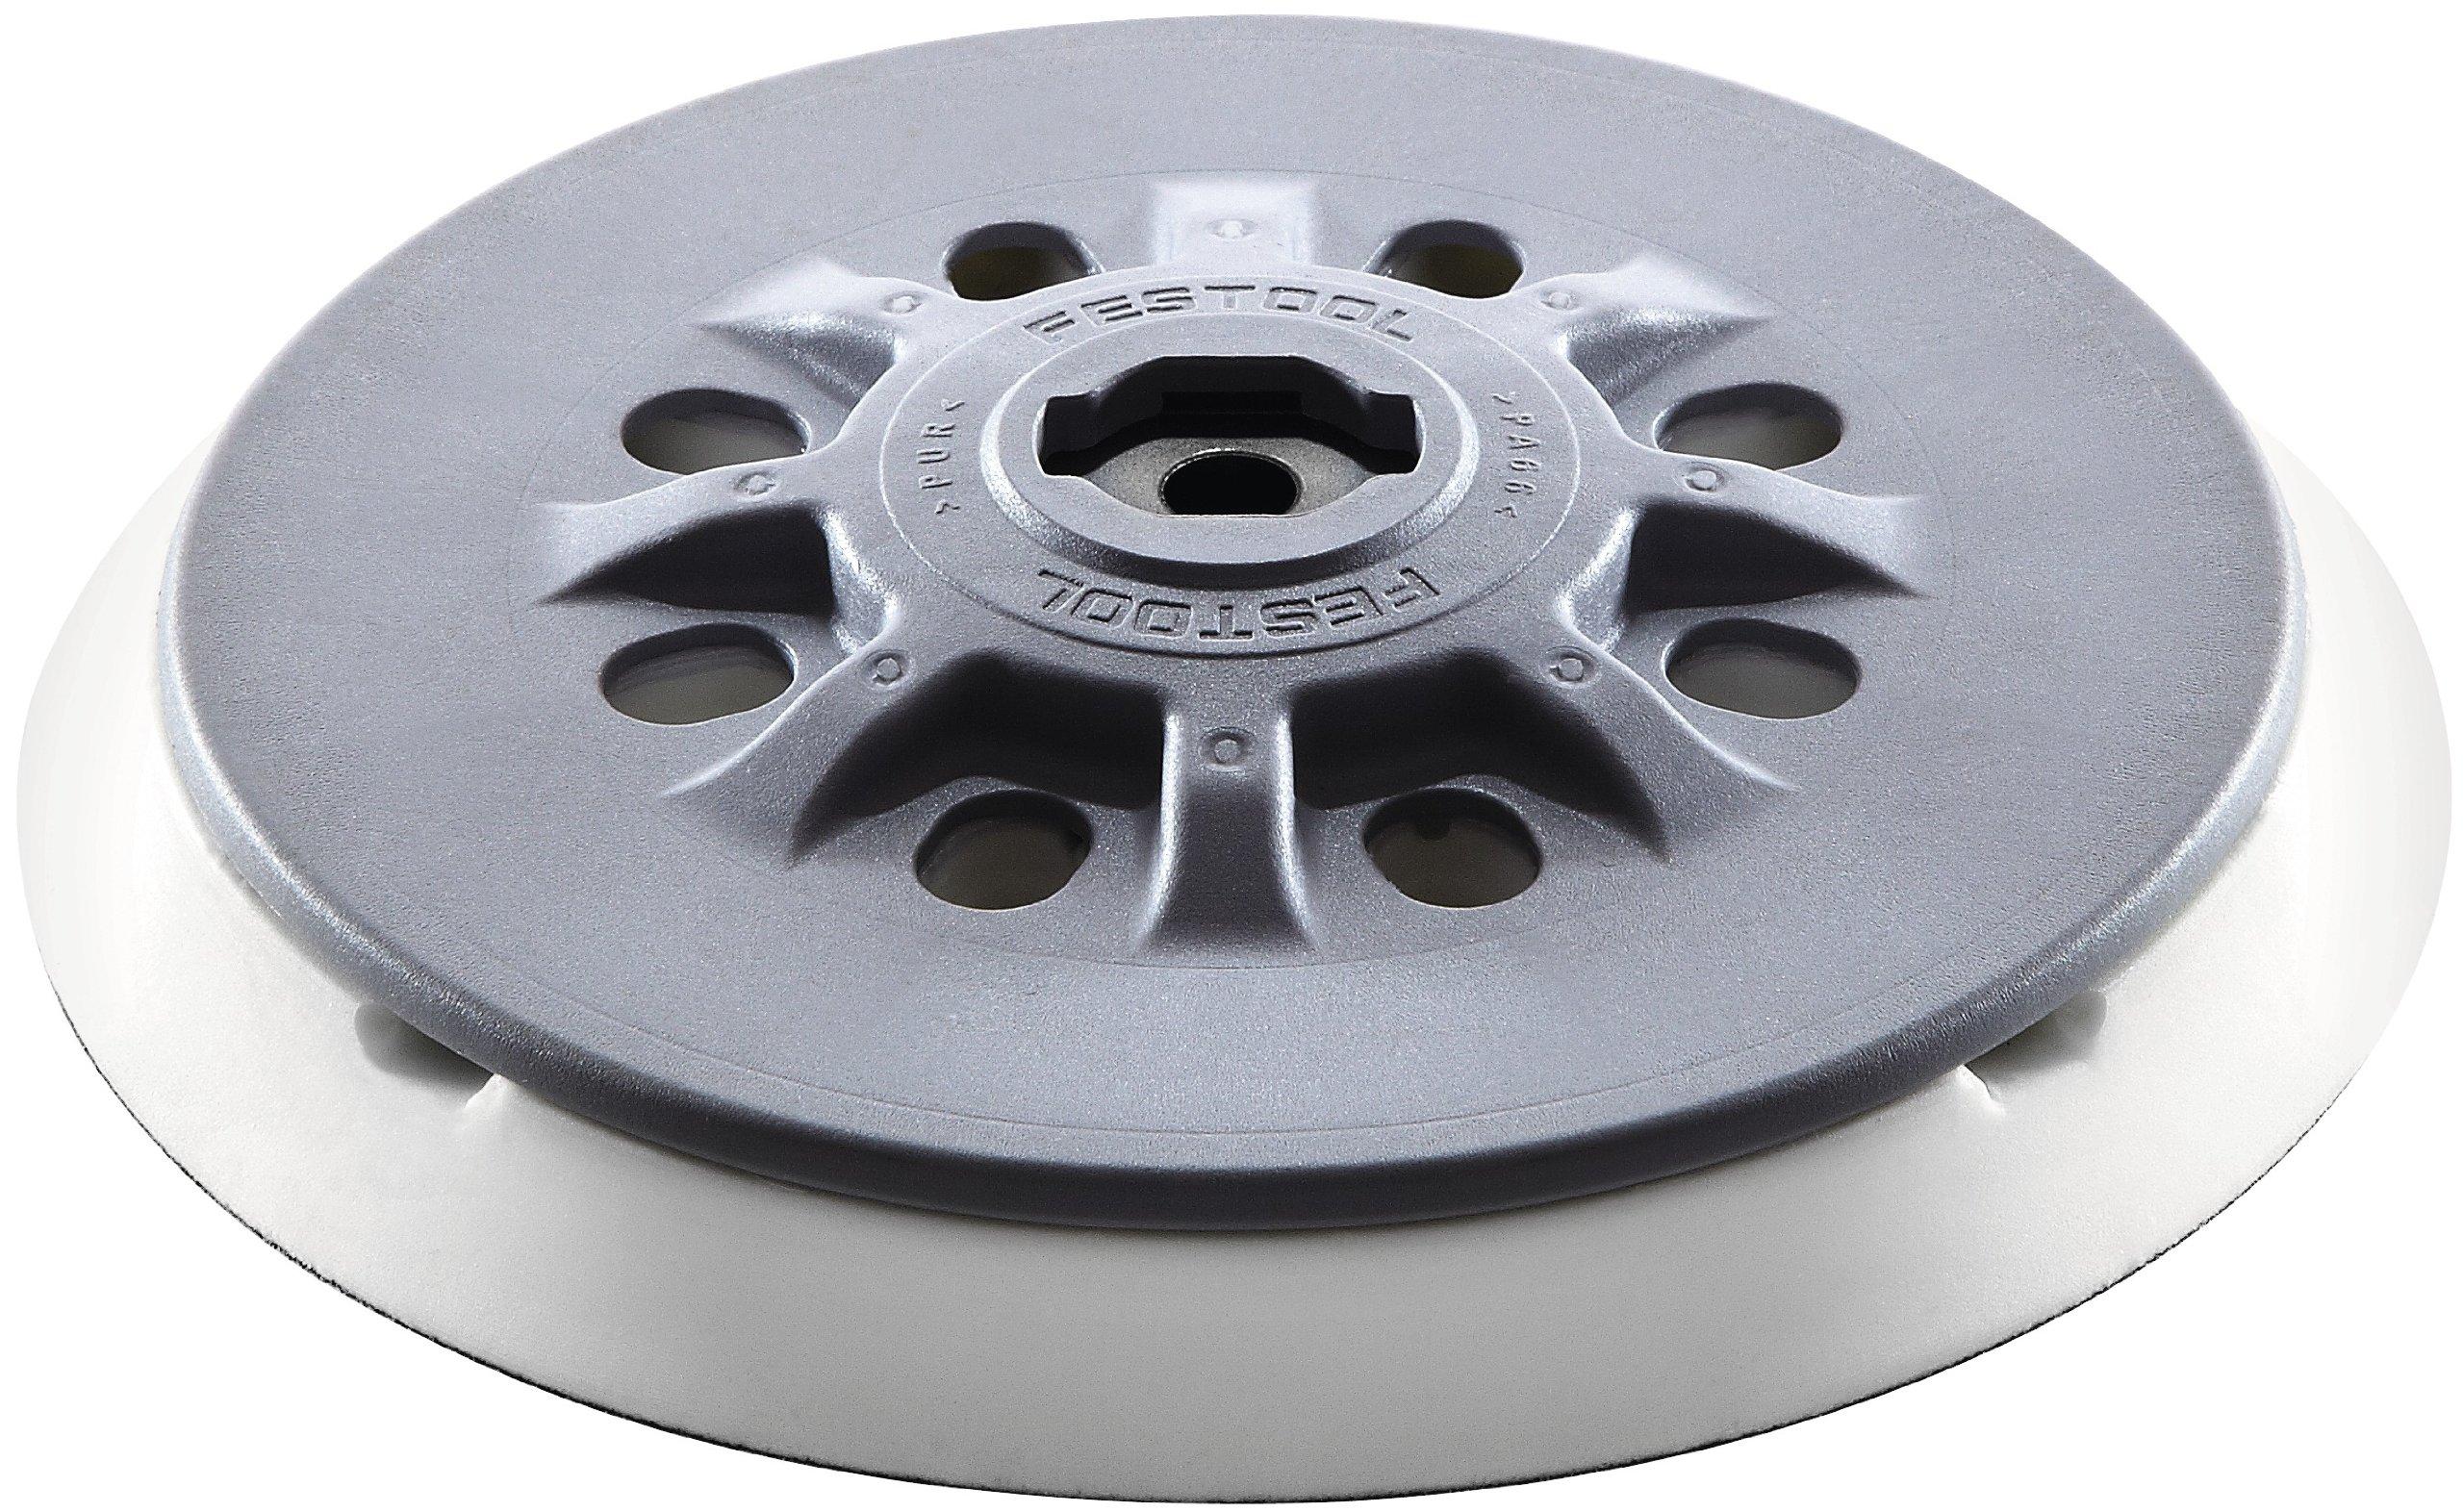 Festool 498986 Fusion-Tec MultiJetstream Super-Soft Sanding Pad, 150mm Diameter